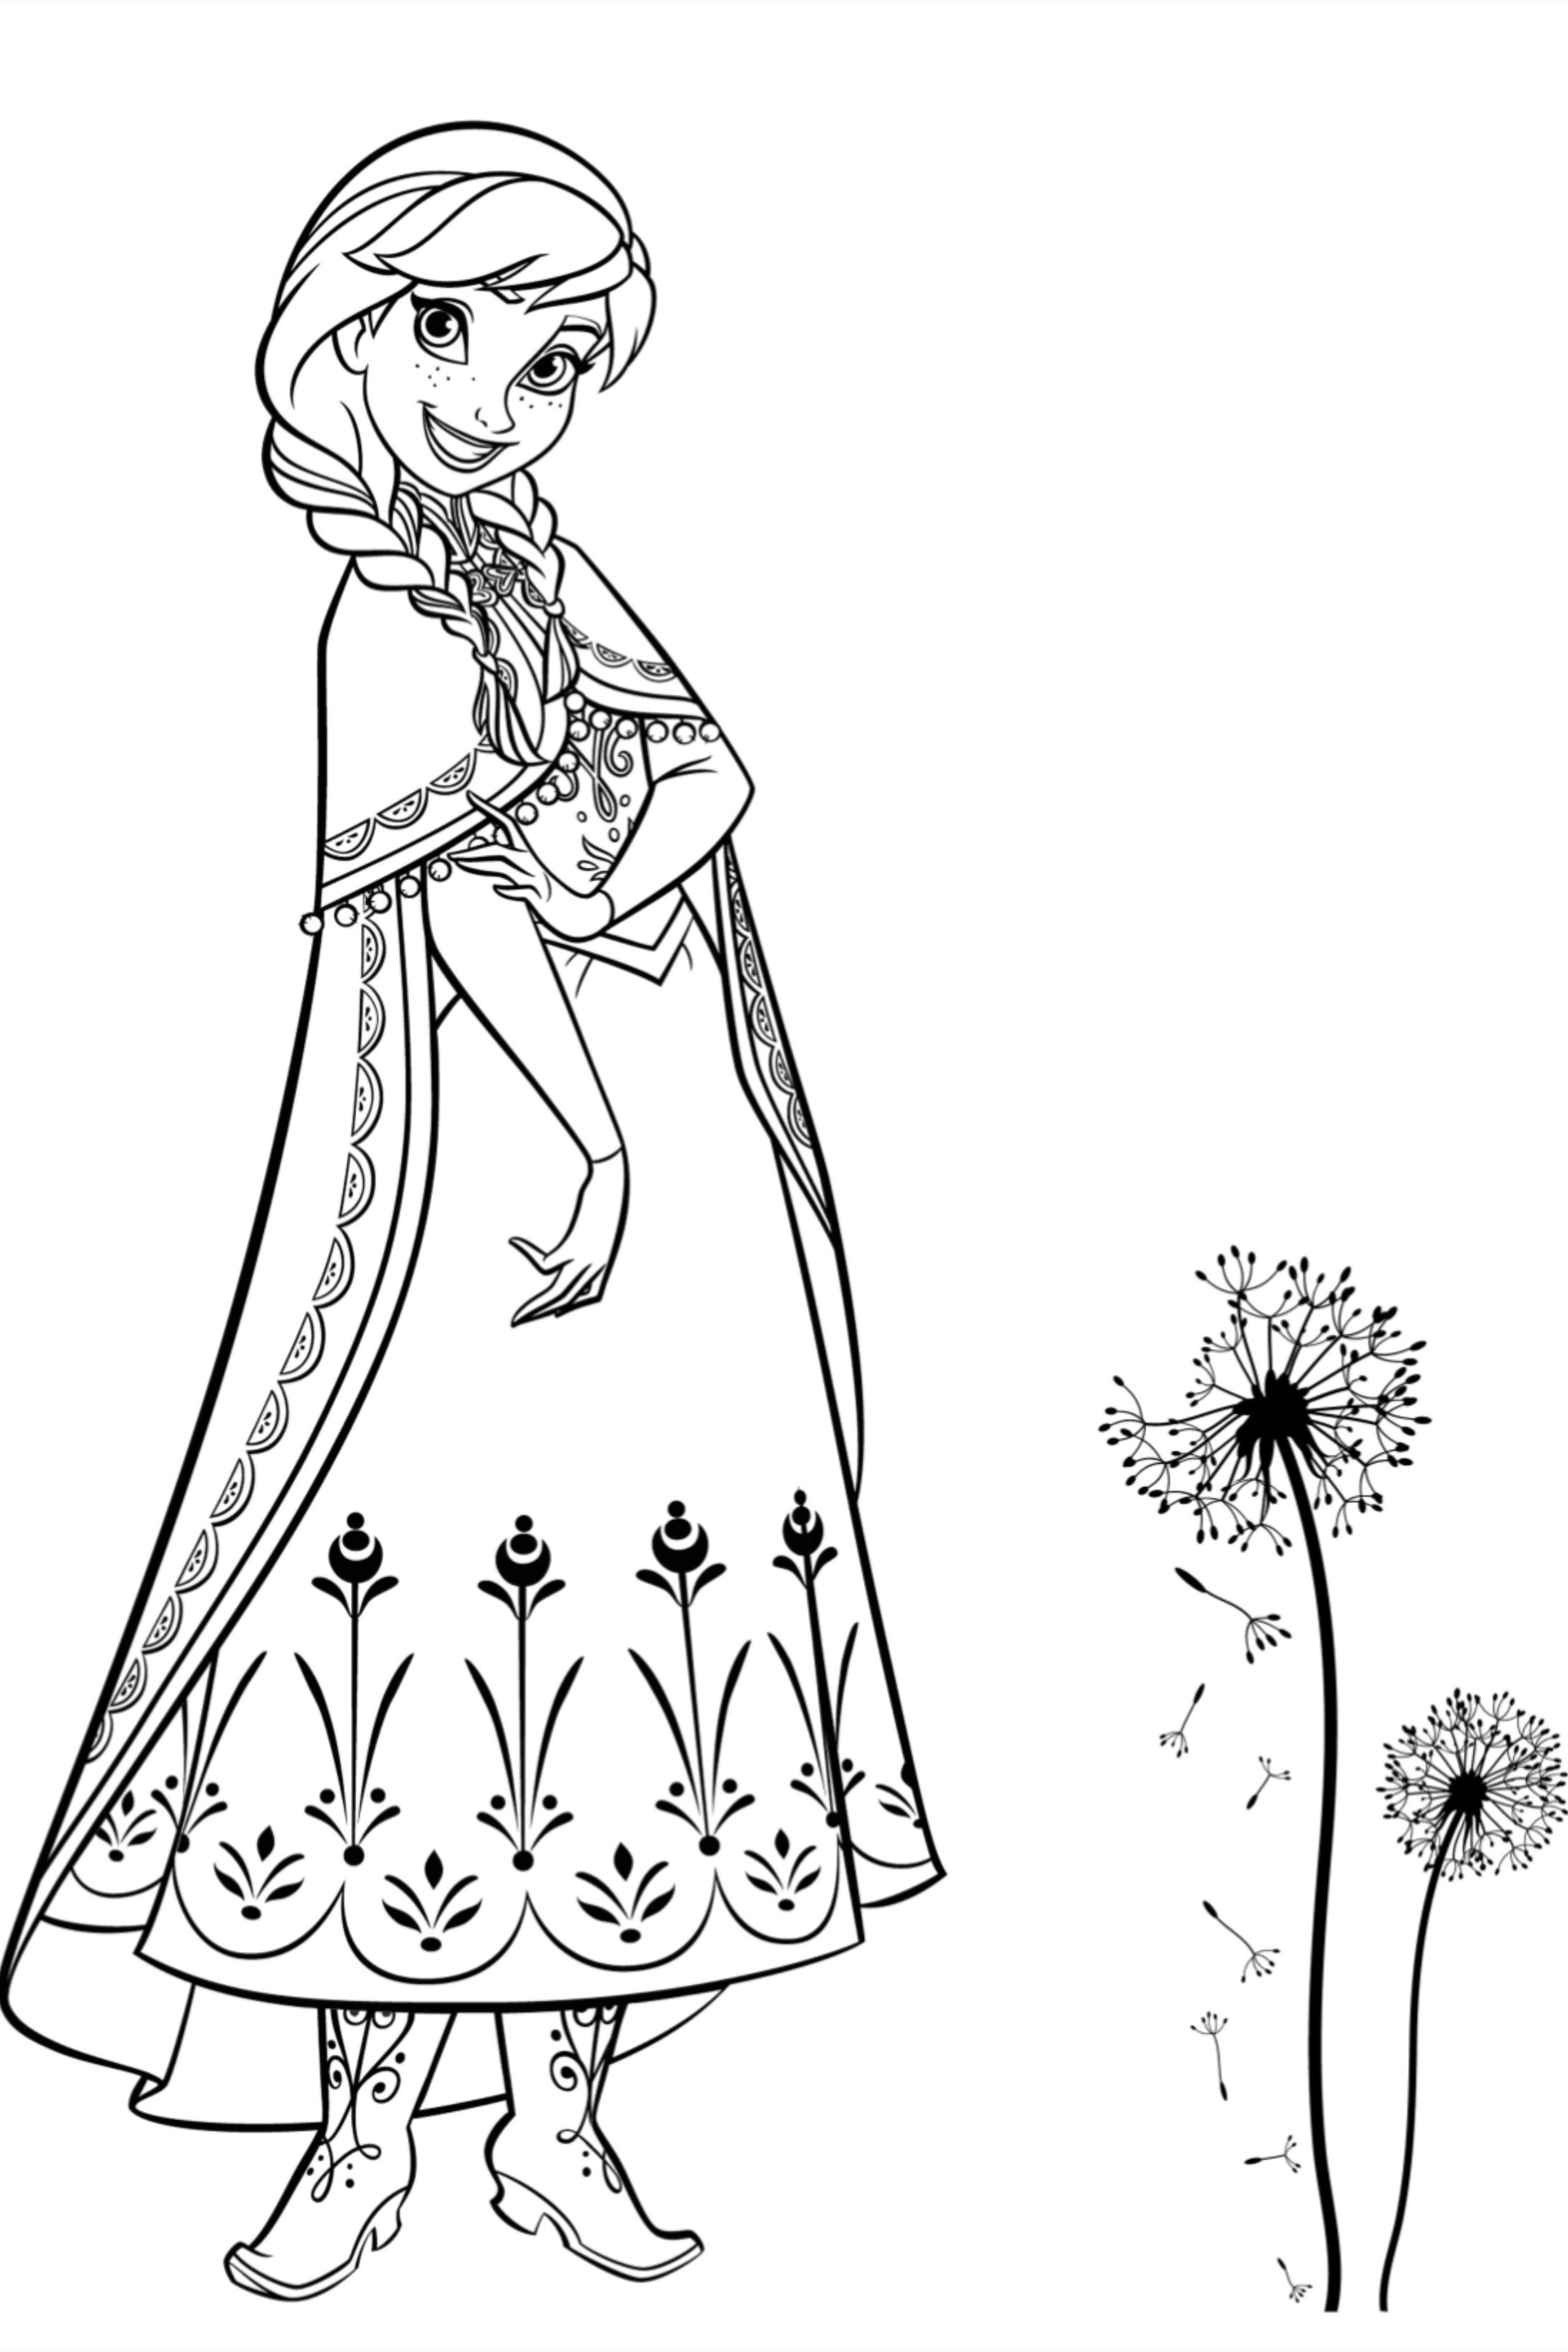 30 Elsa Princess Coloring Pages For Kids Princess Coloring Pages Princess Coloring Elsa Coloring Pages